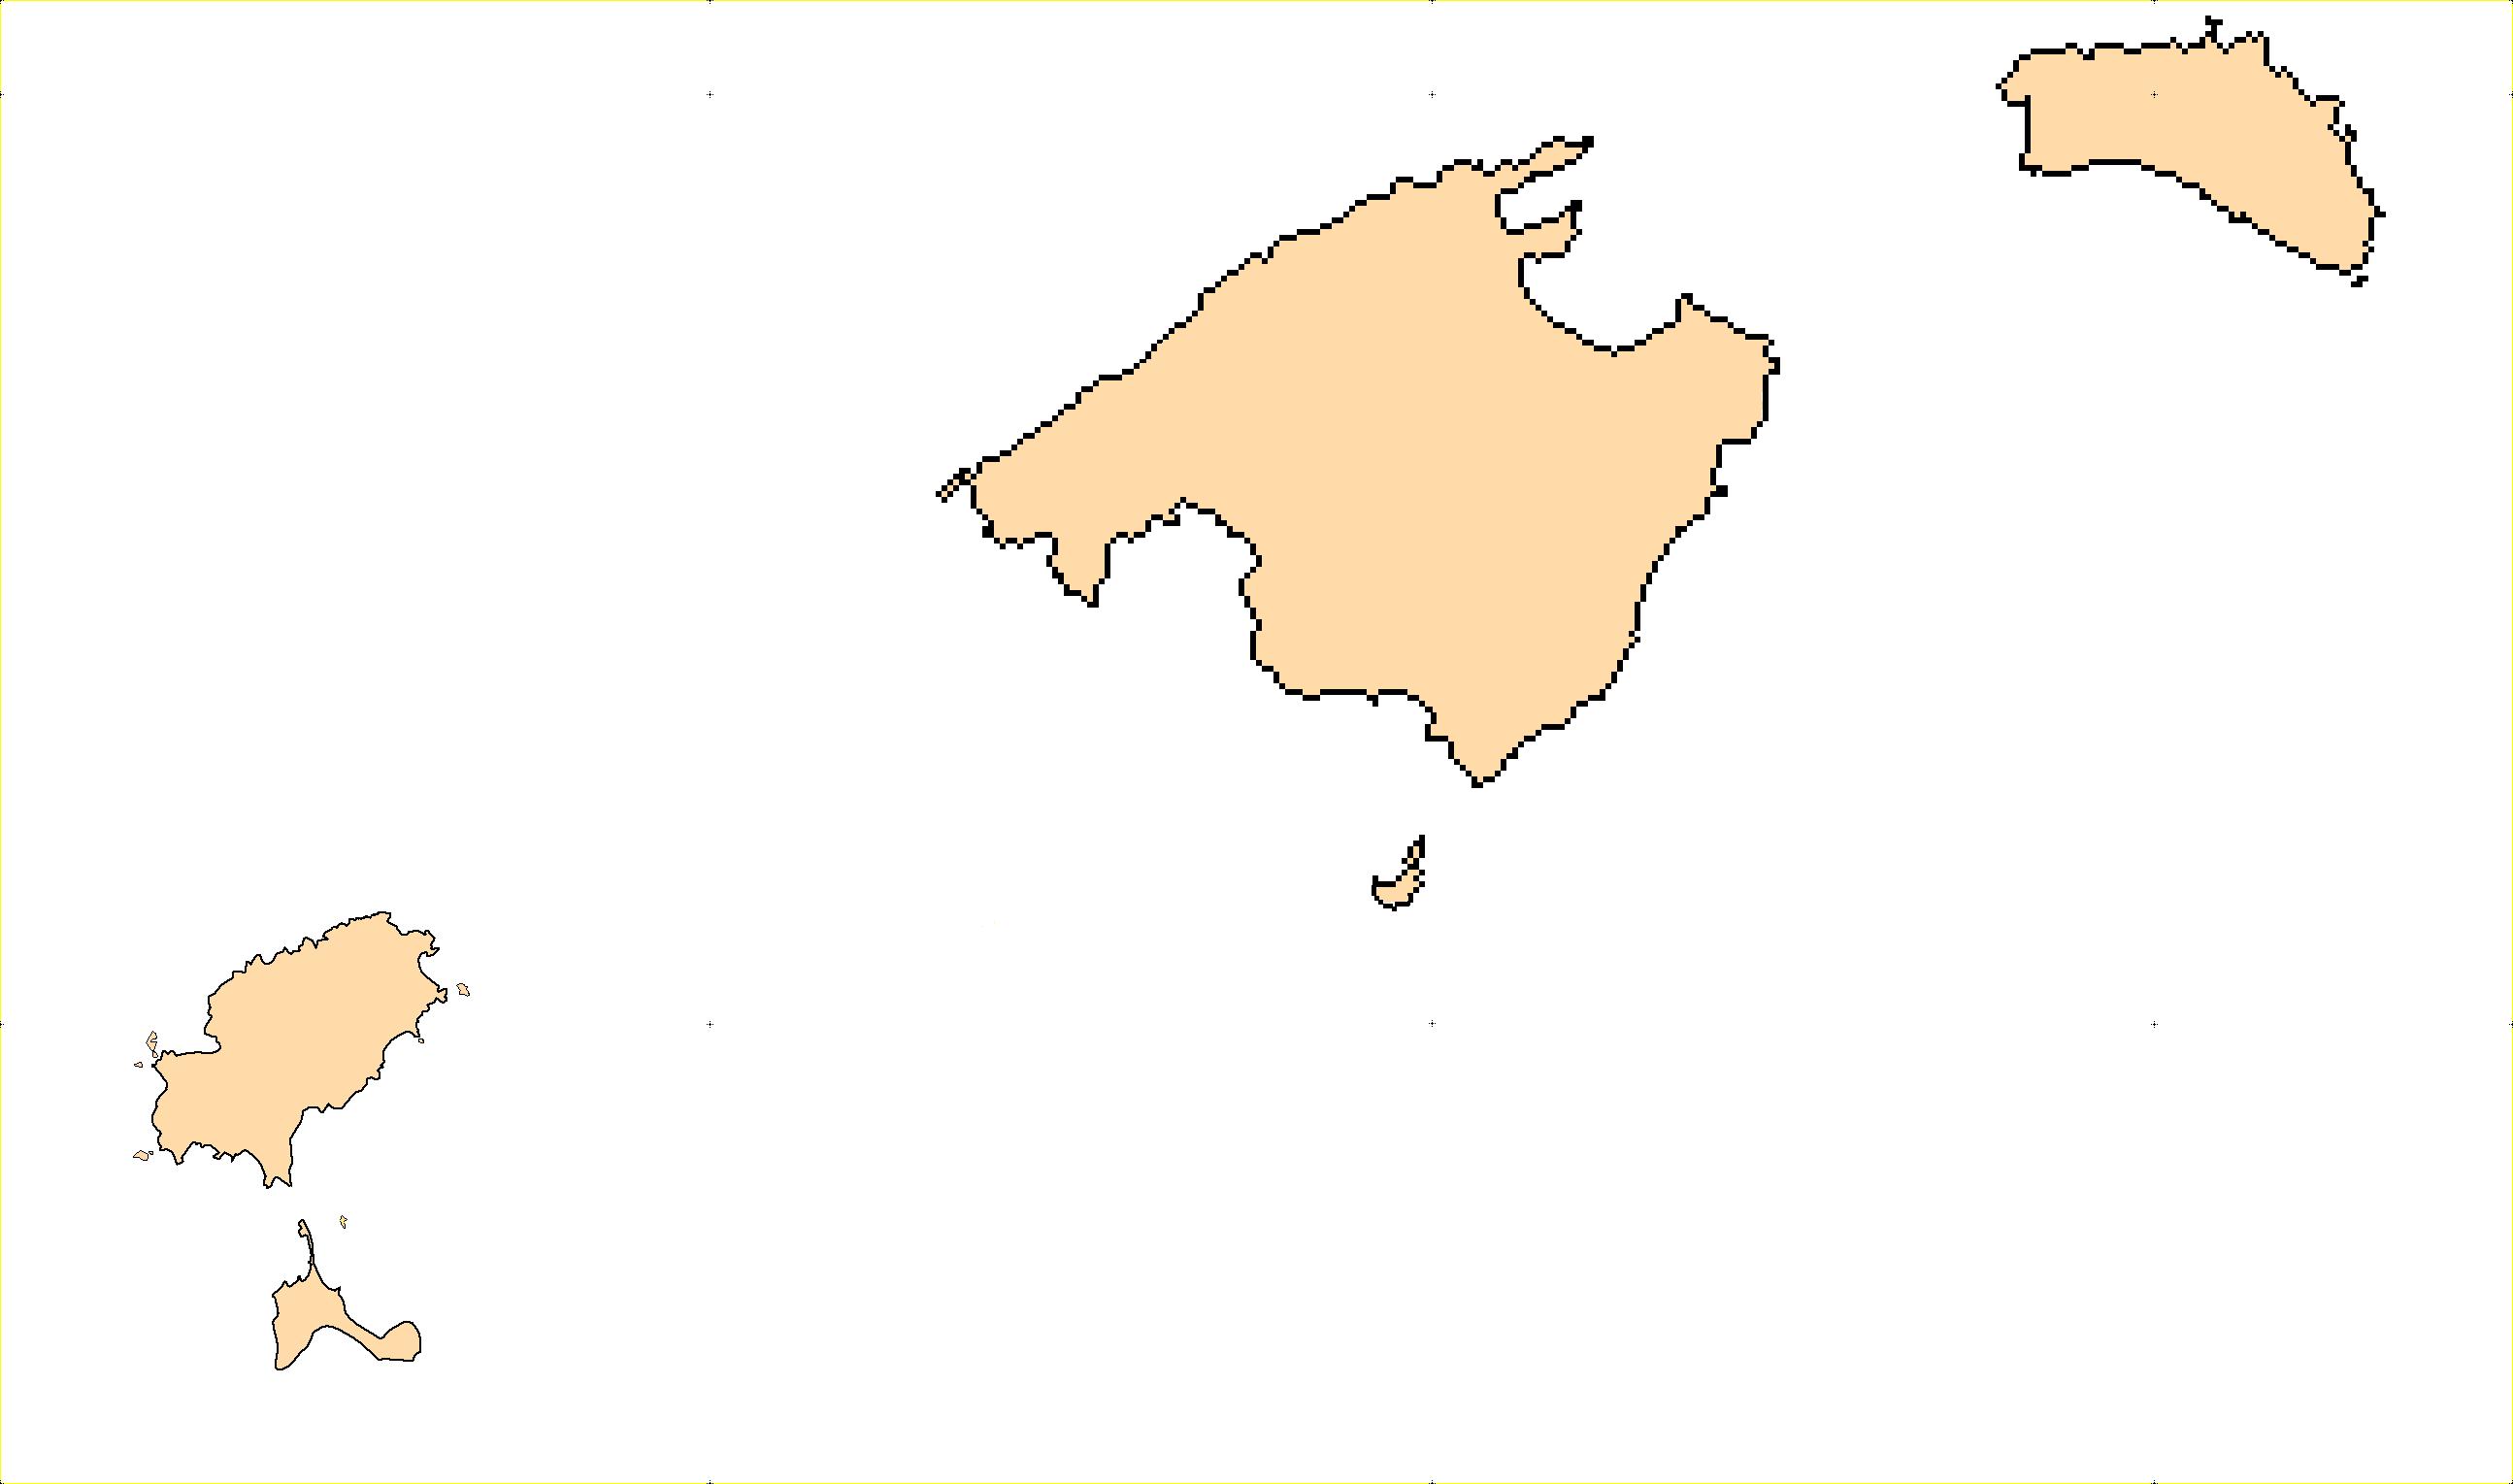 baleares mapa Archivo:Mapa de Localitzación de Baleares 2.png   Wikipedia, la  baleares mapa